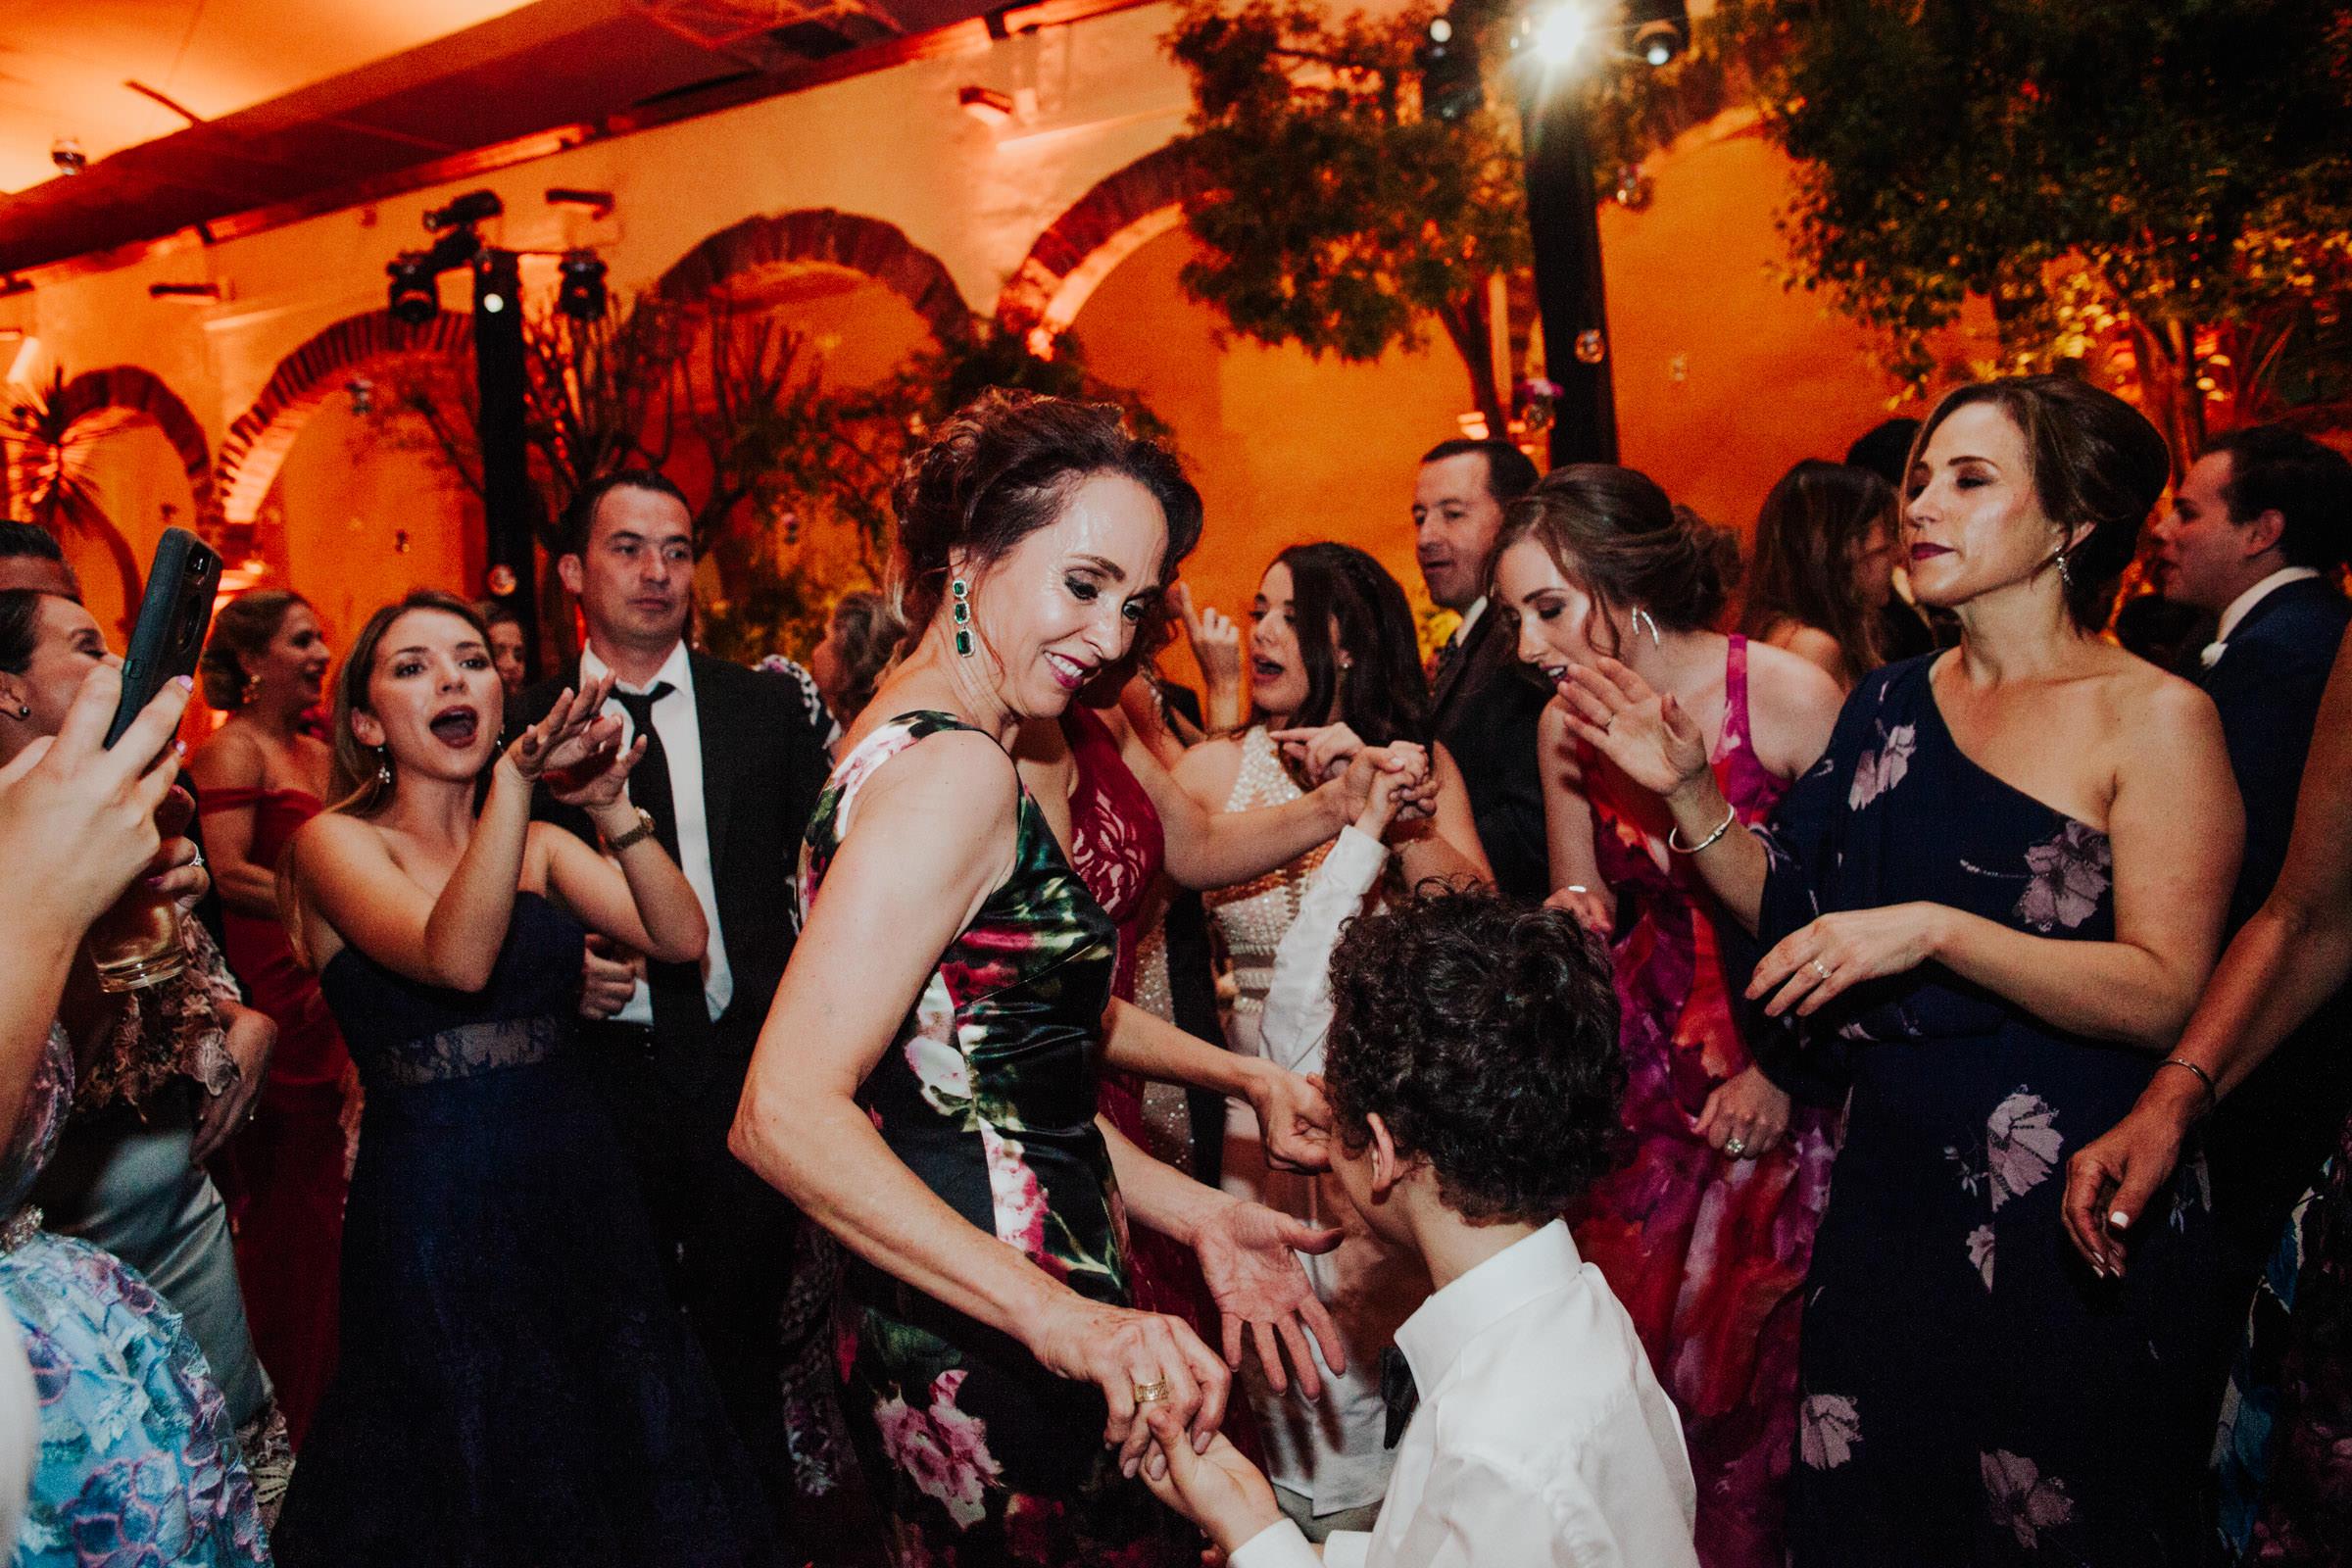 San-Miguel-de-Allende-Wedding-Photography-Parroquia-Instituto-Boda-Fotografia-Fer-Sergio-Pierce-Lifestyle-Photography0050.JPG